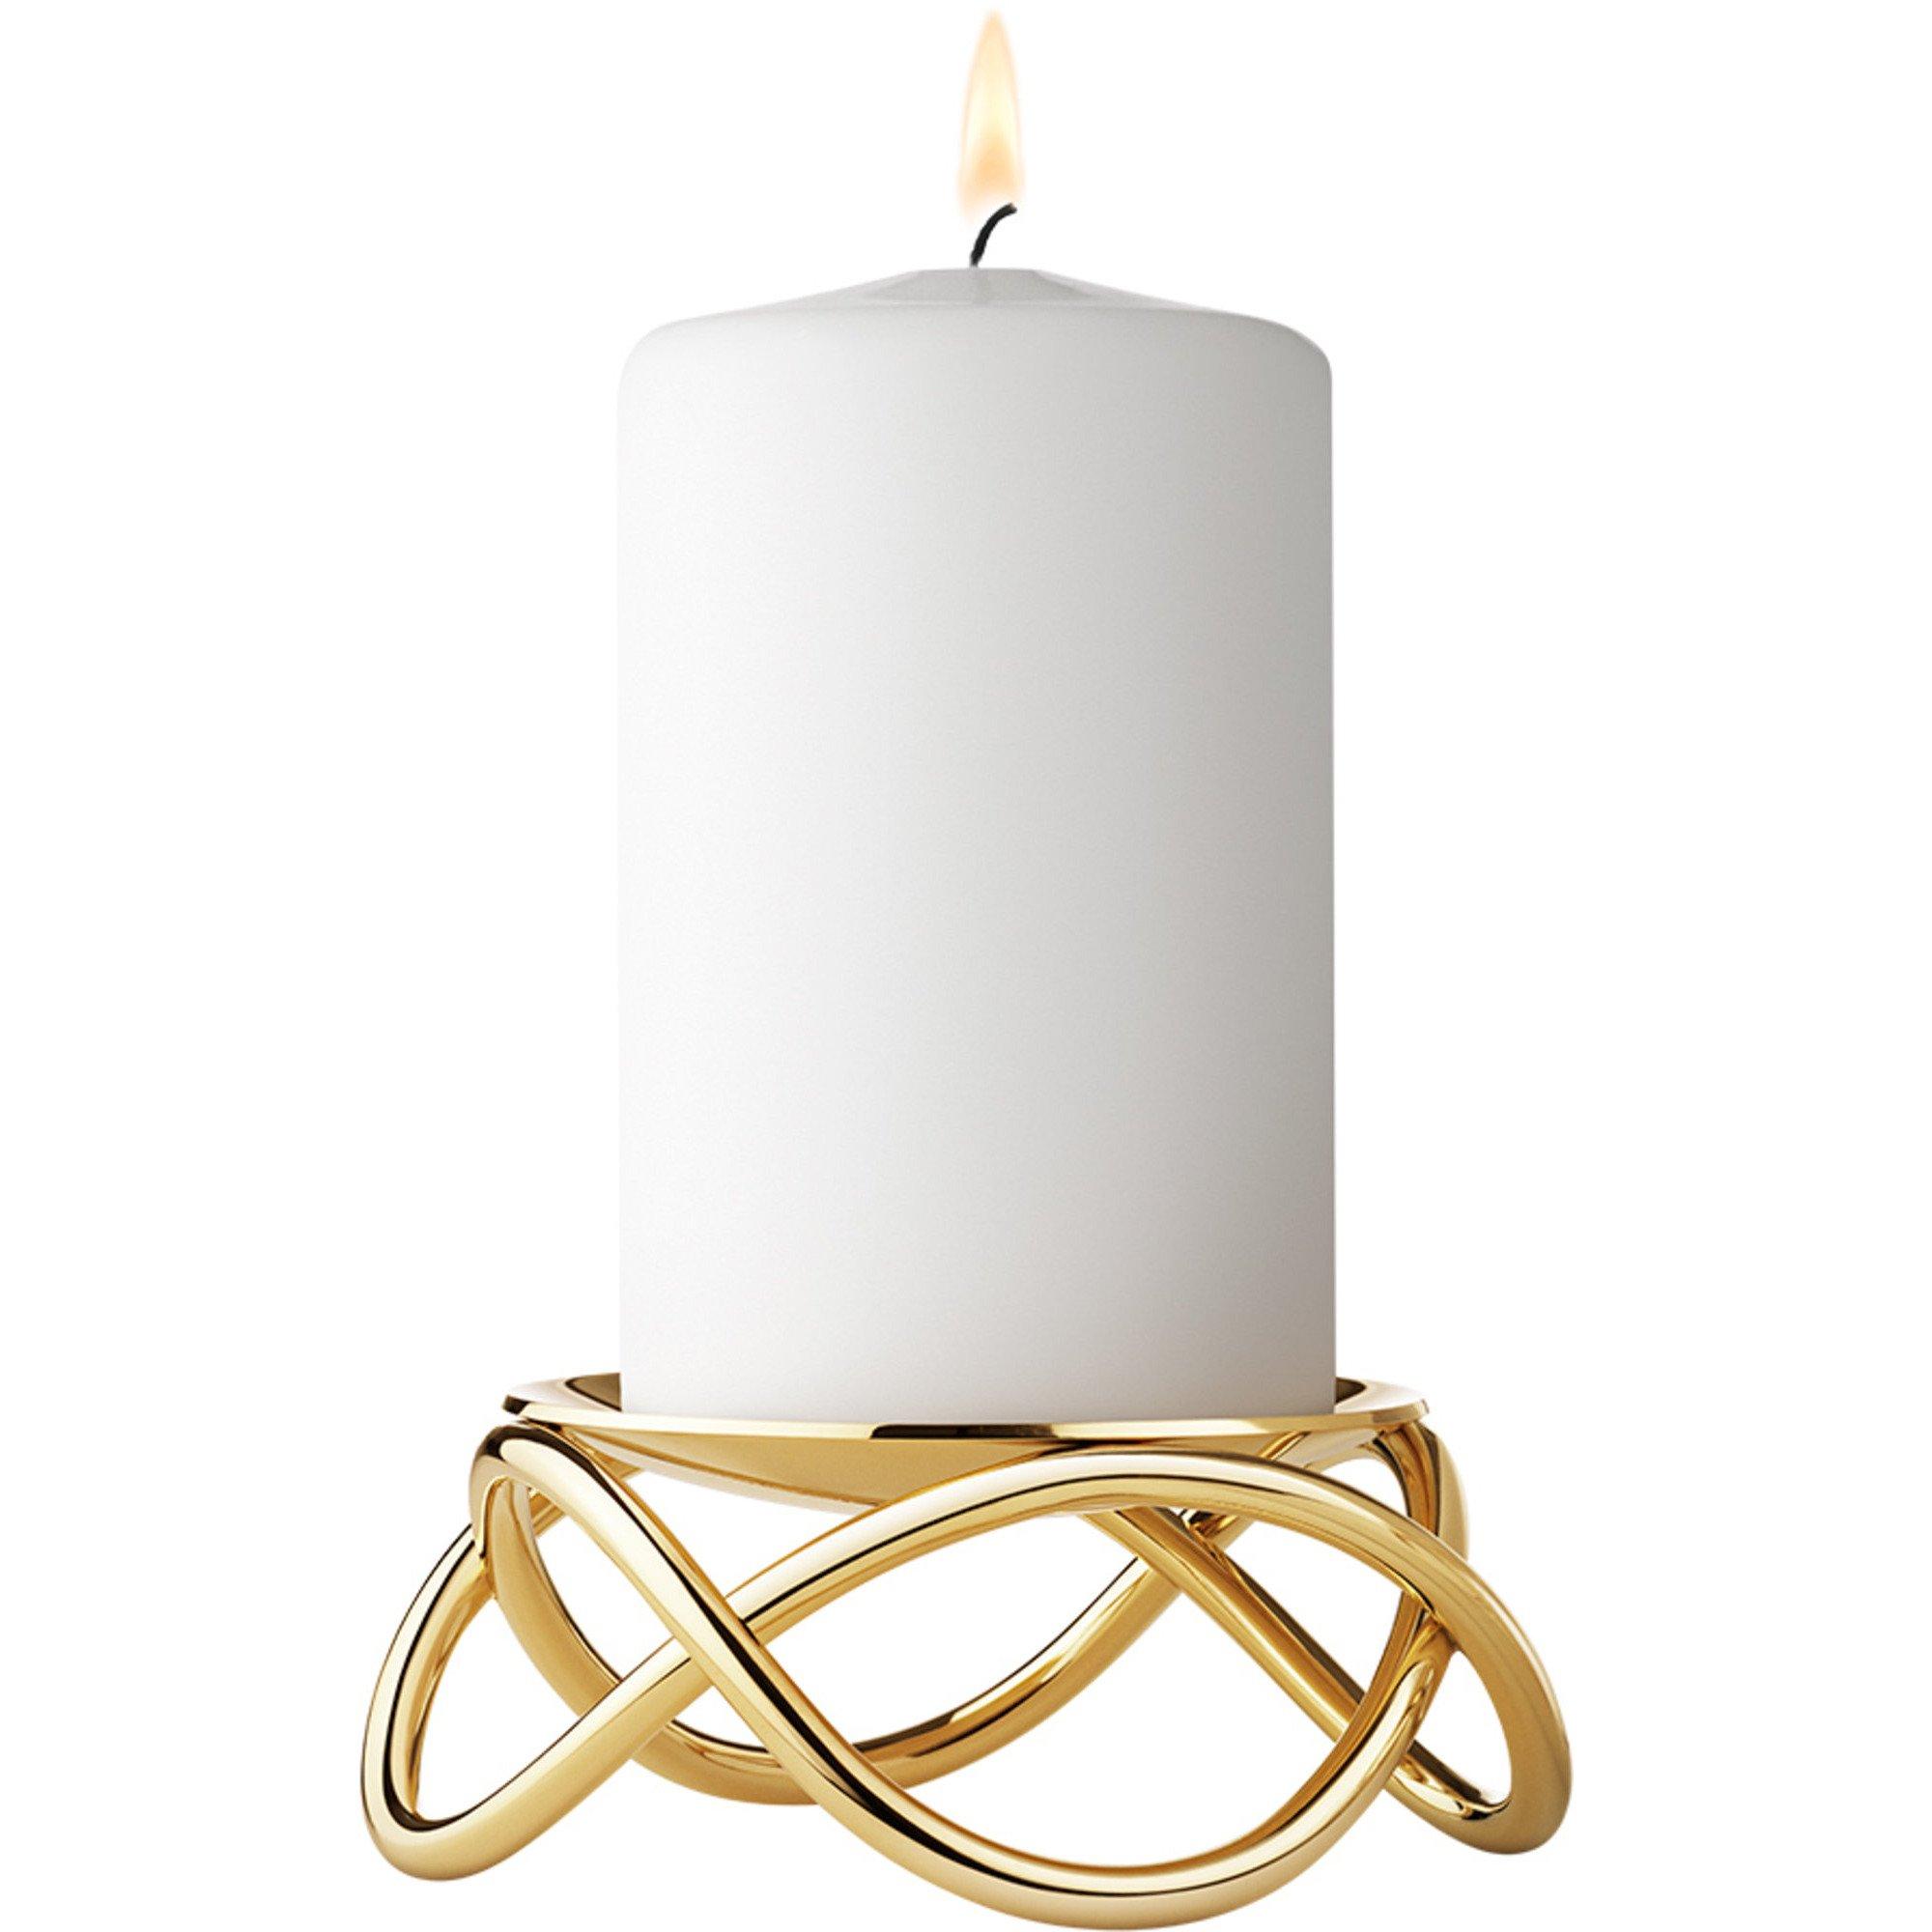 Georg Jensen Glow Ljusstake Förgyllt rostfritt stål, Guld